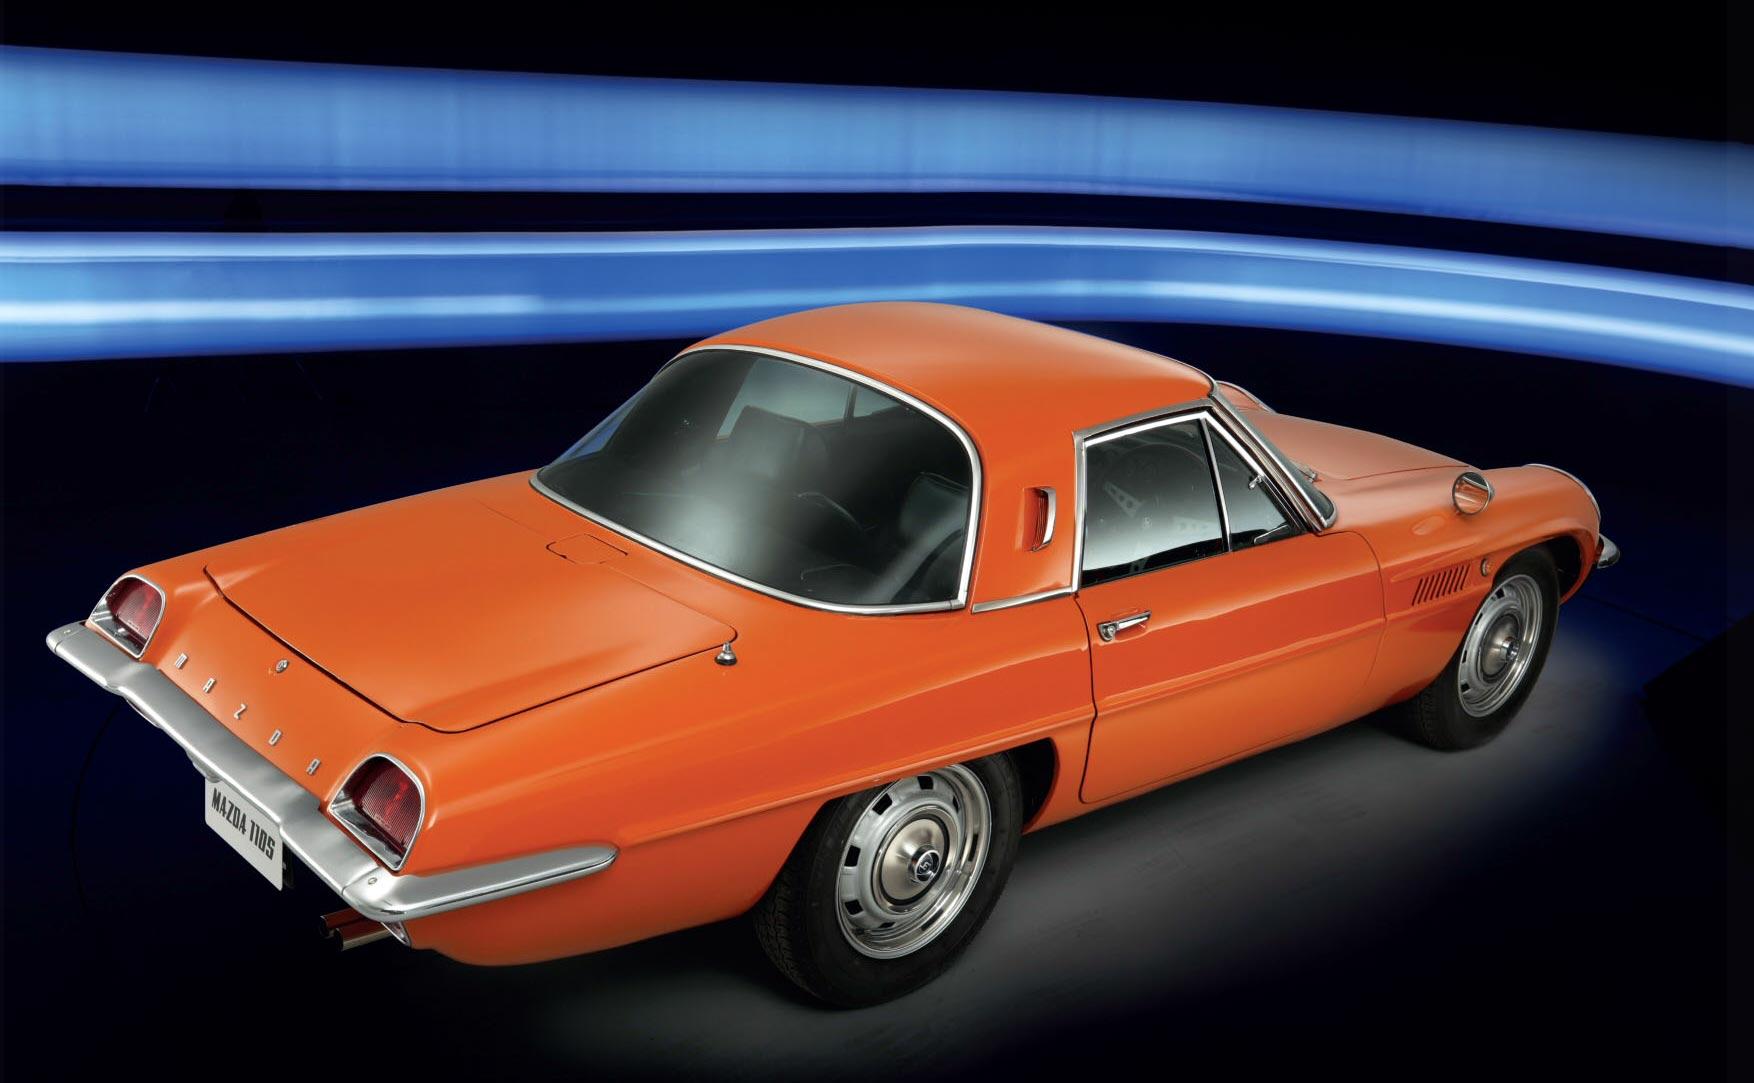 Mazda's ultra-radical Cosmo Coupé 110S